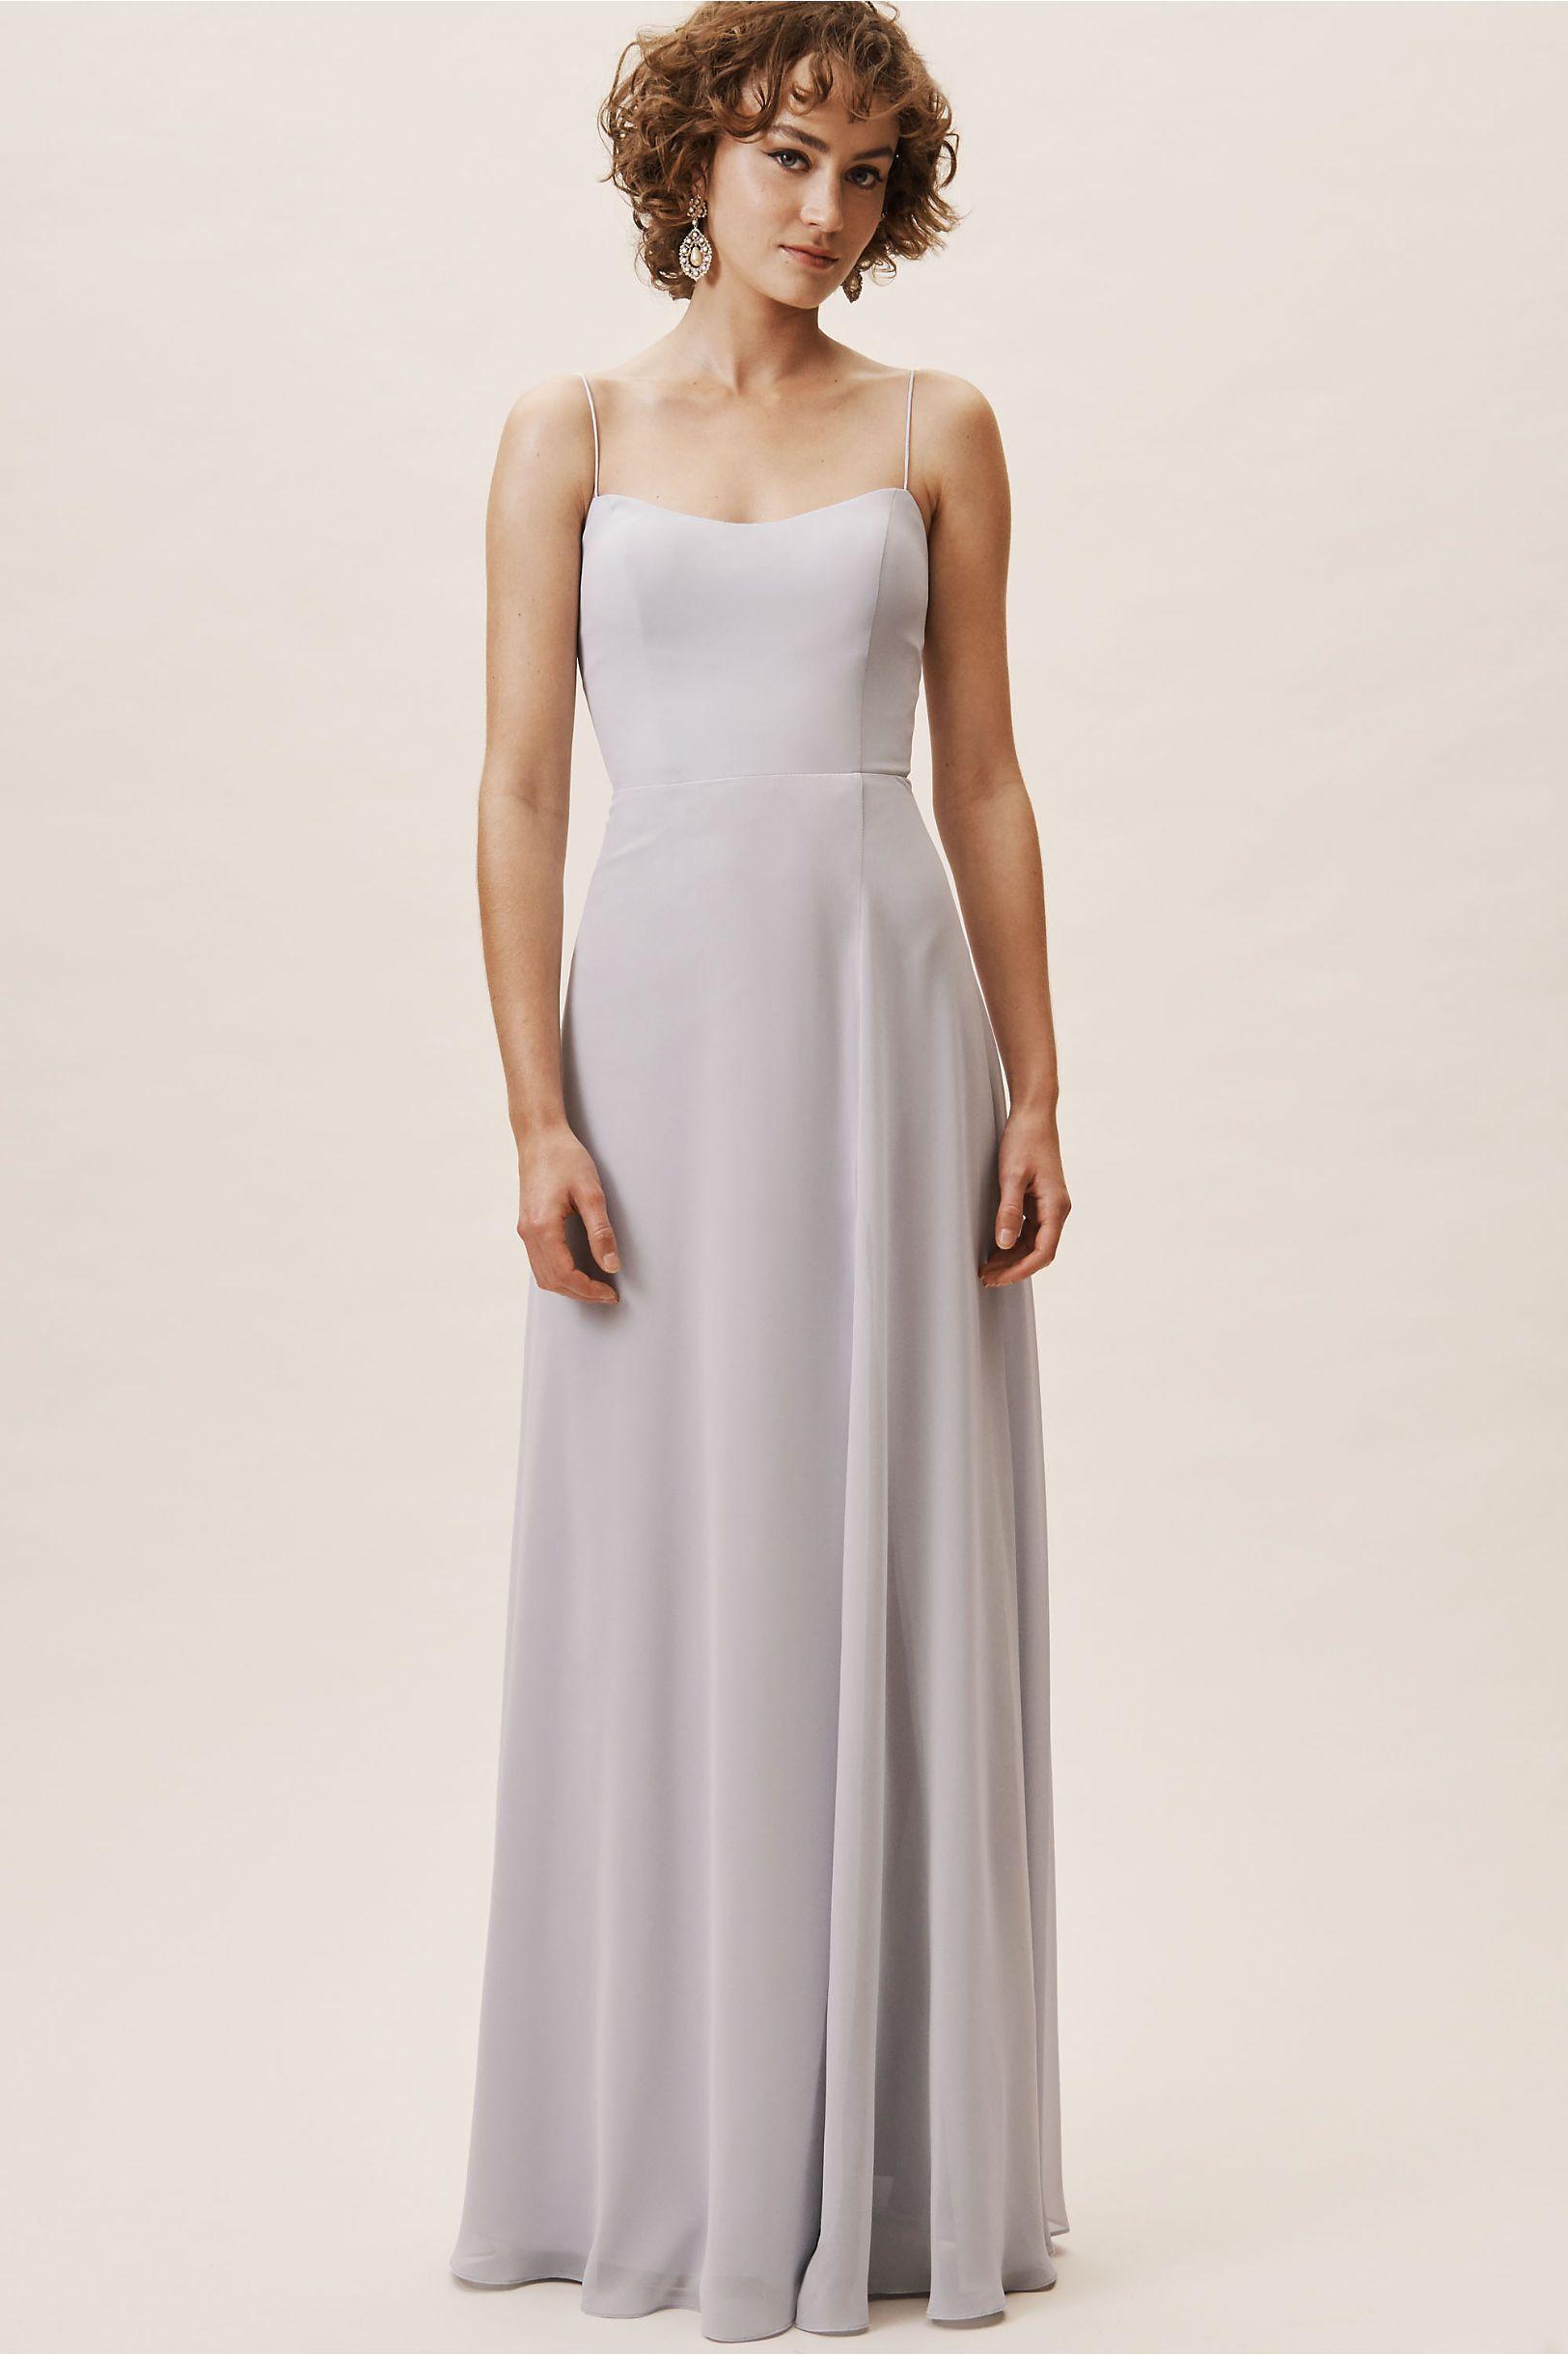 2b10c720fa BHLDN s Jenny Yoo Kiara Dress in Whisper Blue in 2019